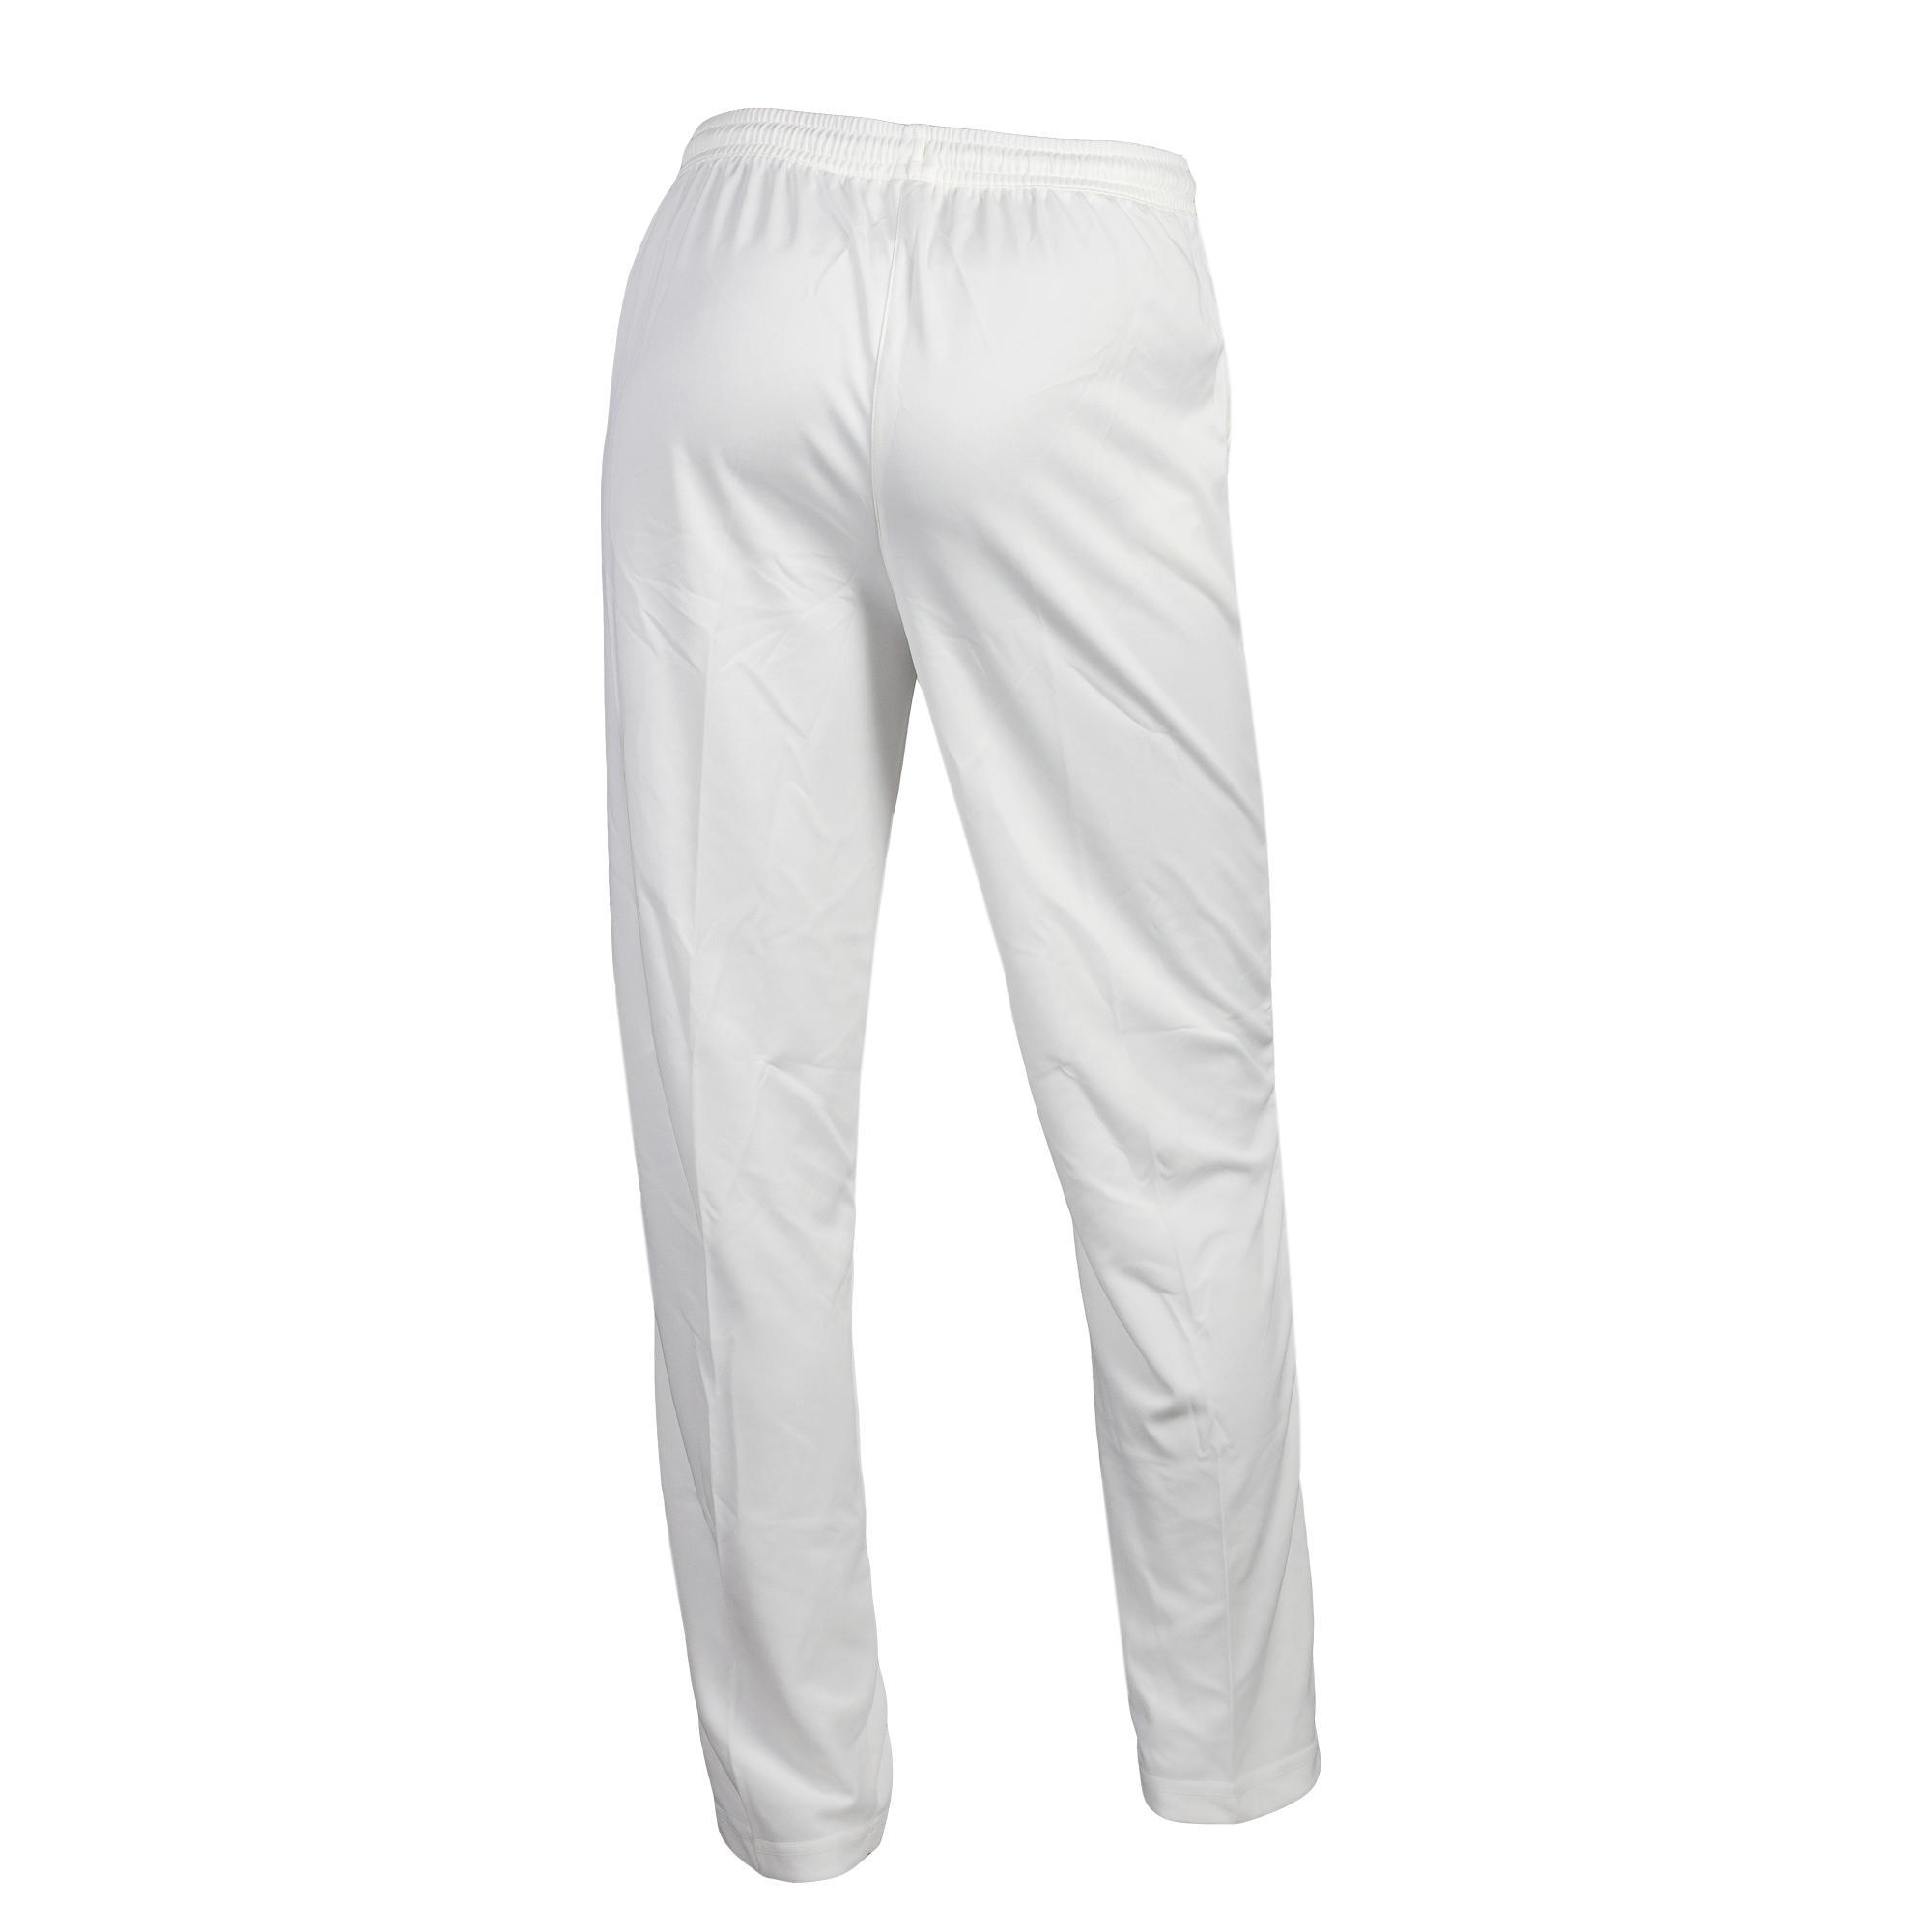 WHITE TROUSER TR 900